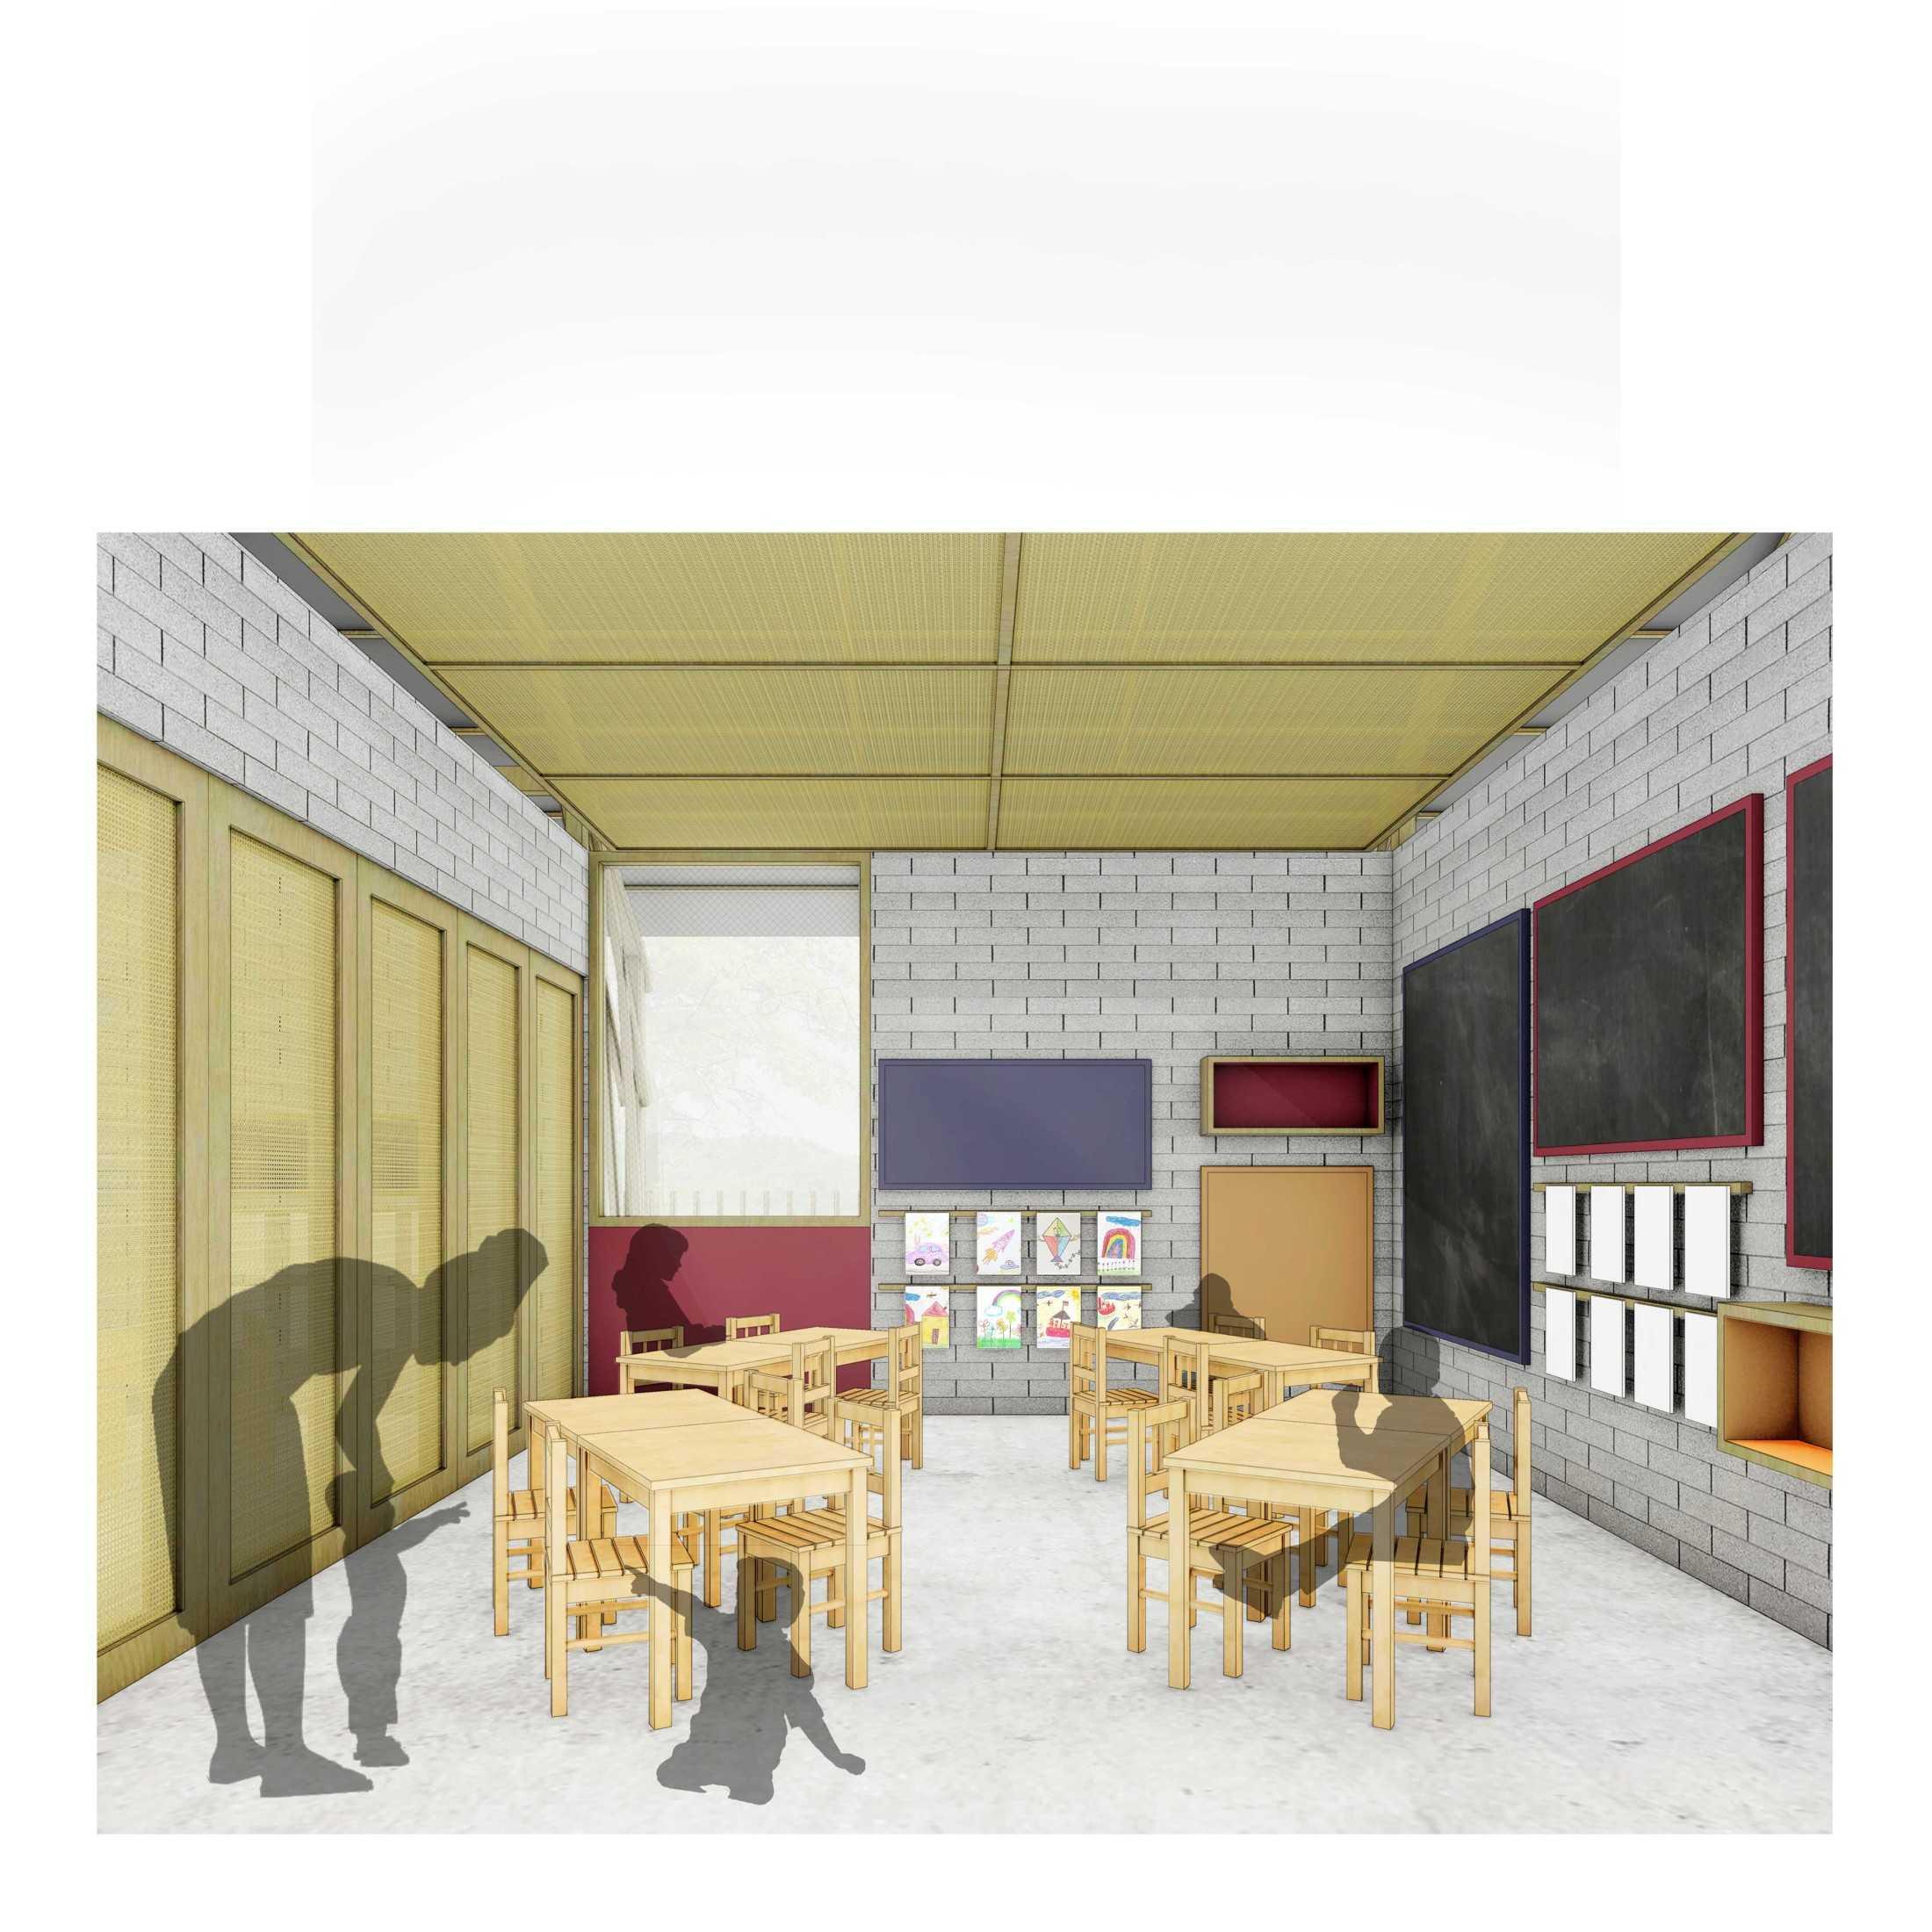 Studiogra/ph Architects Mentari School Kabupaten Tapanuli Utara, Sumatera Utara, Indonesia Kabupaten Tapanuli Utara, Sumatera Utara, Indonesia Studiograph-Architects-Mentari-School  110053